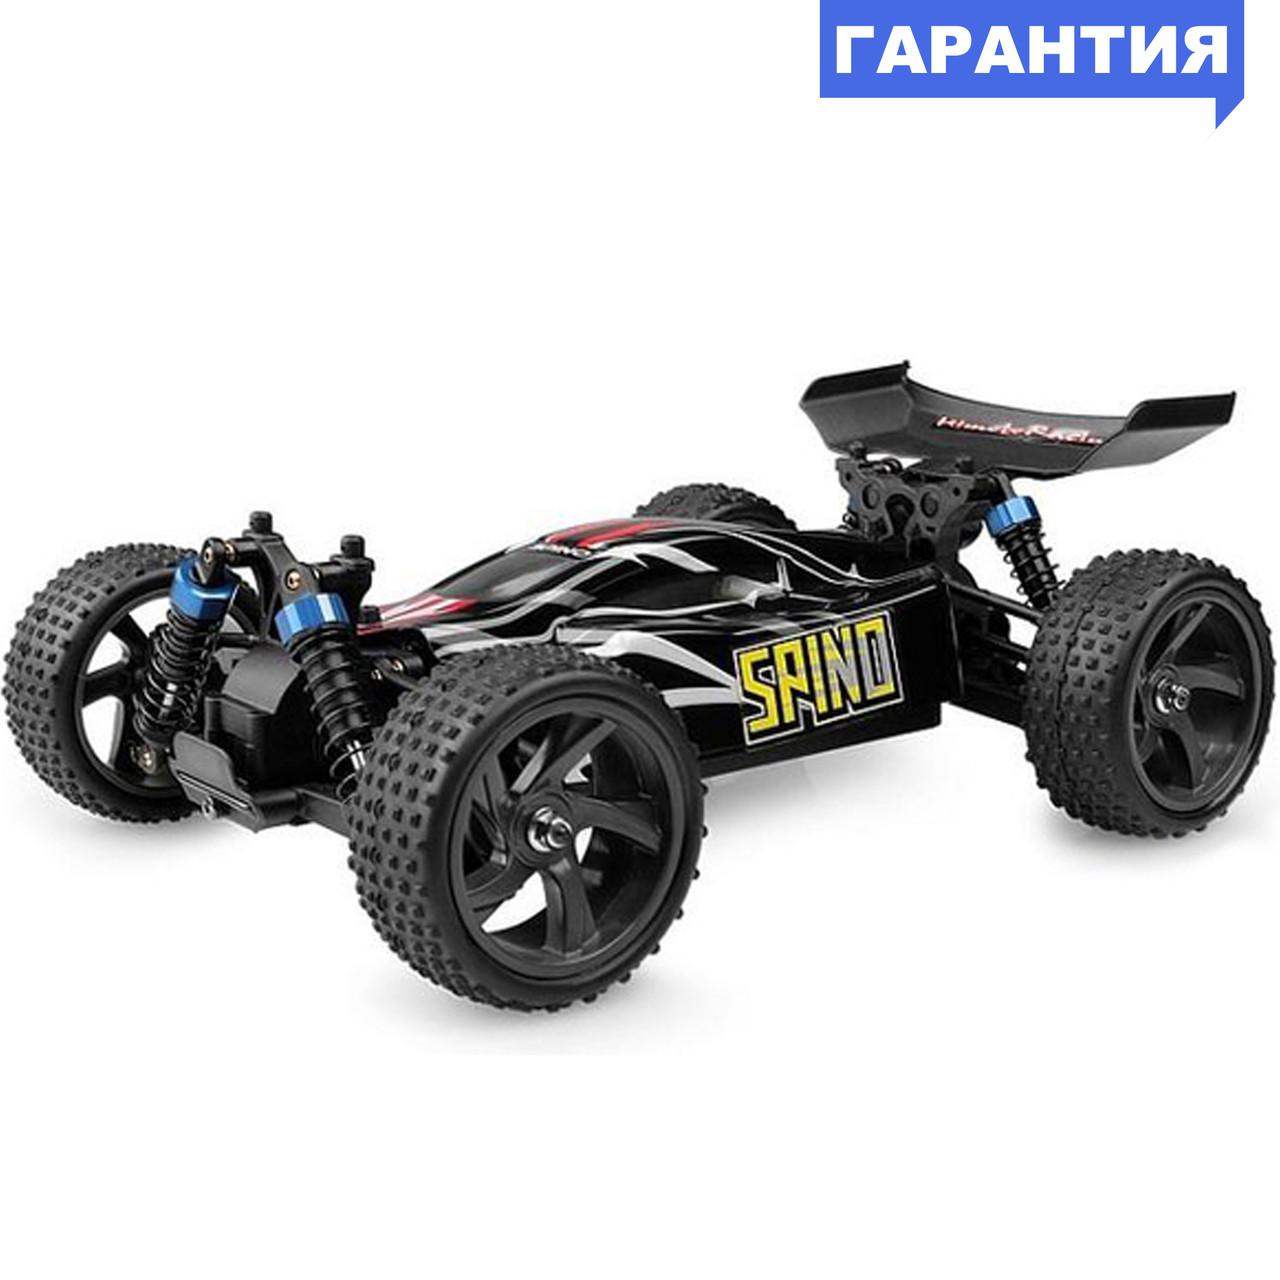 Багги 1:18 Himoto Spino E18XBL Brushless бесколлекторный (черный)